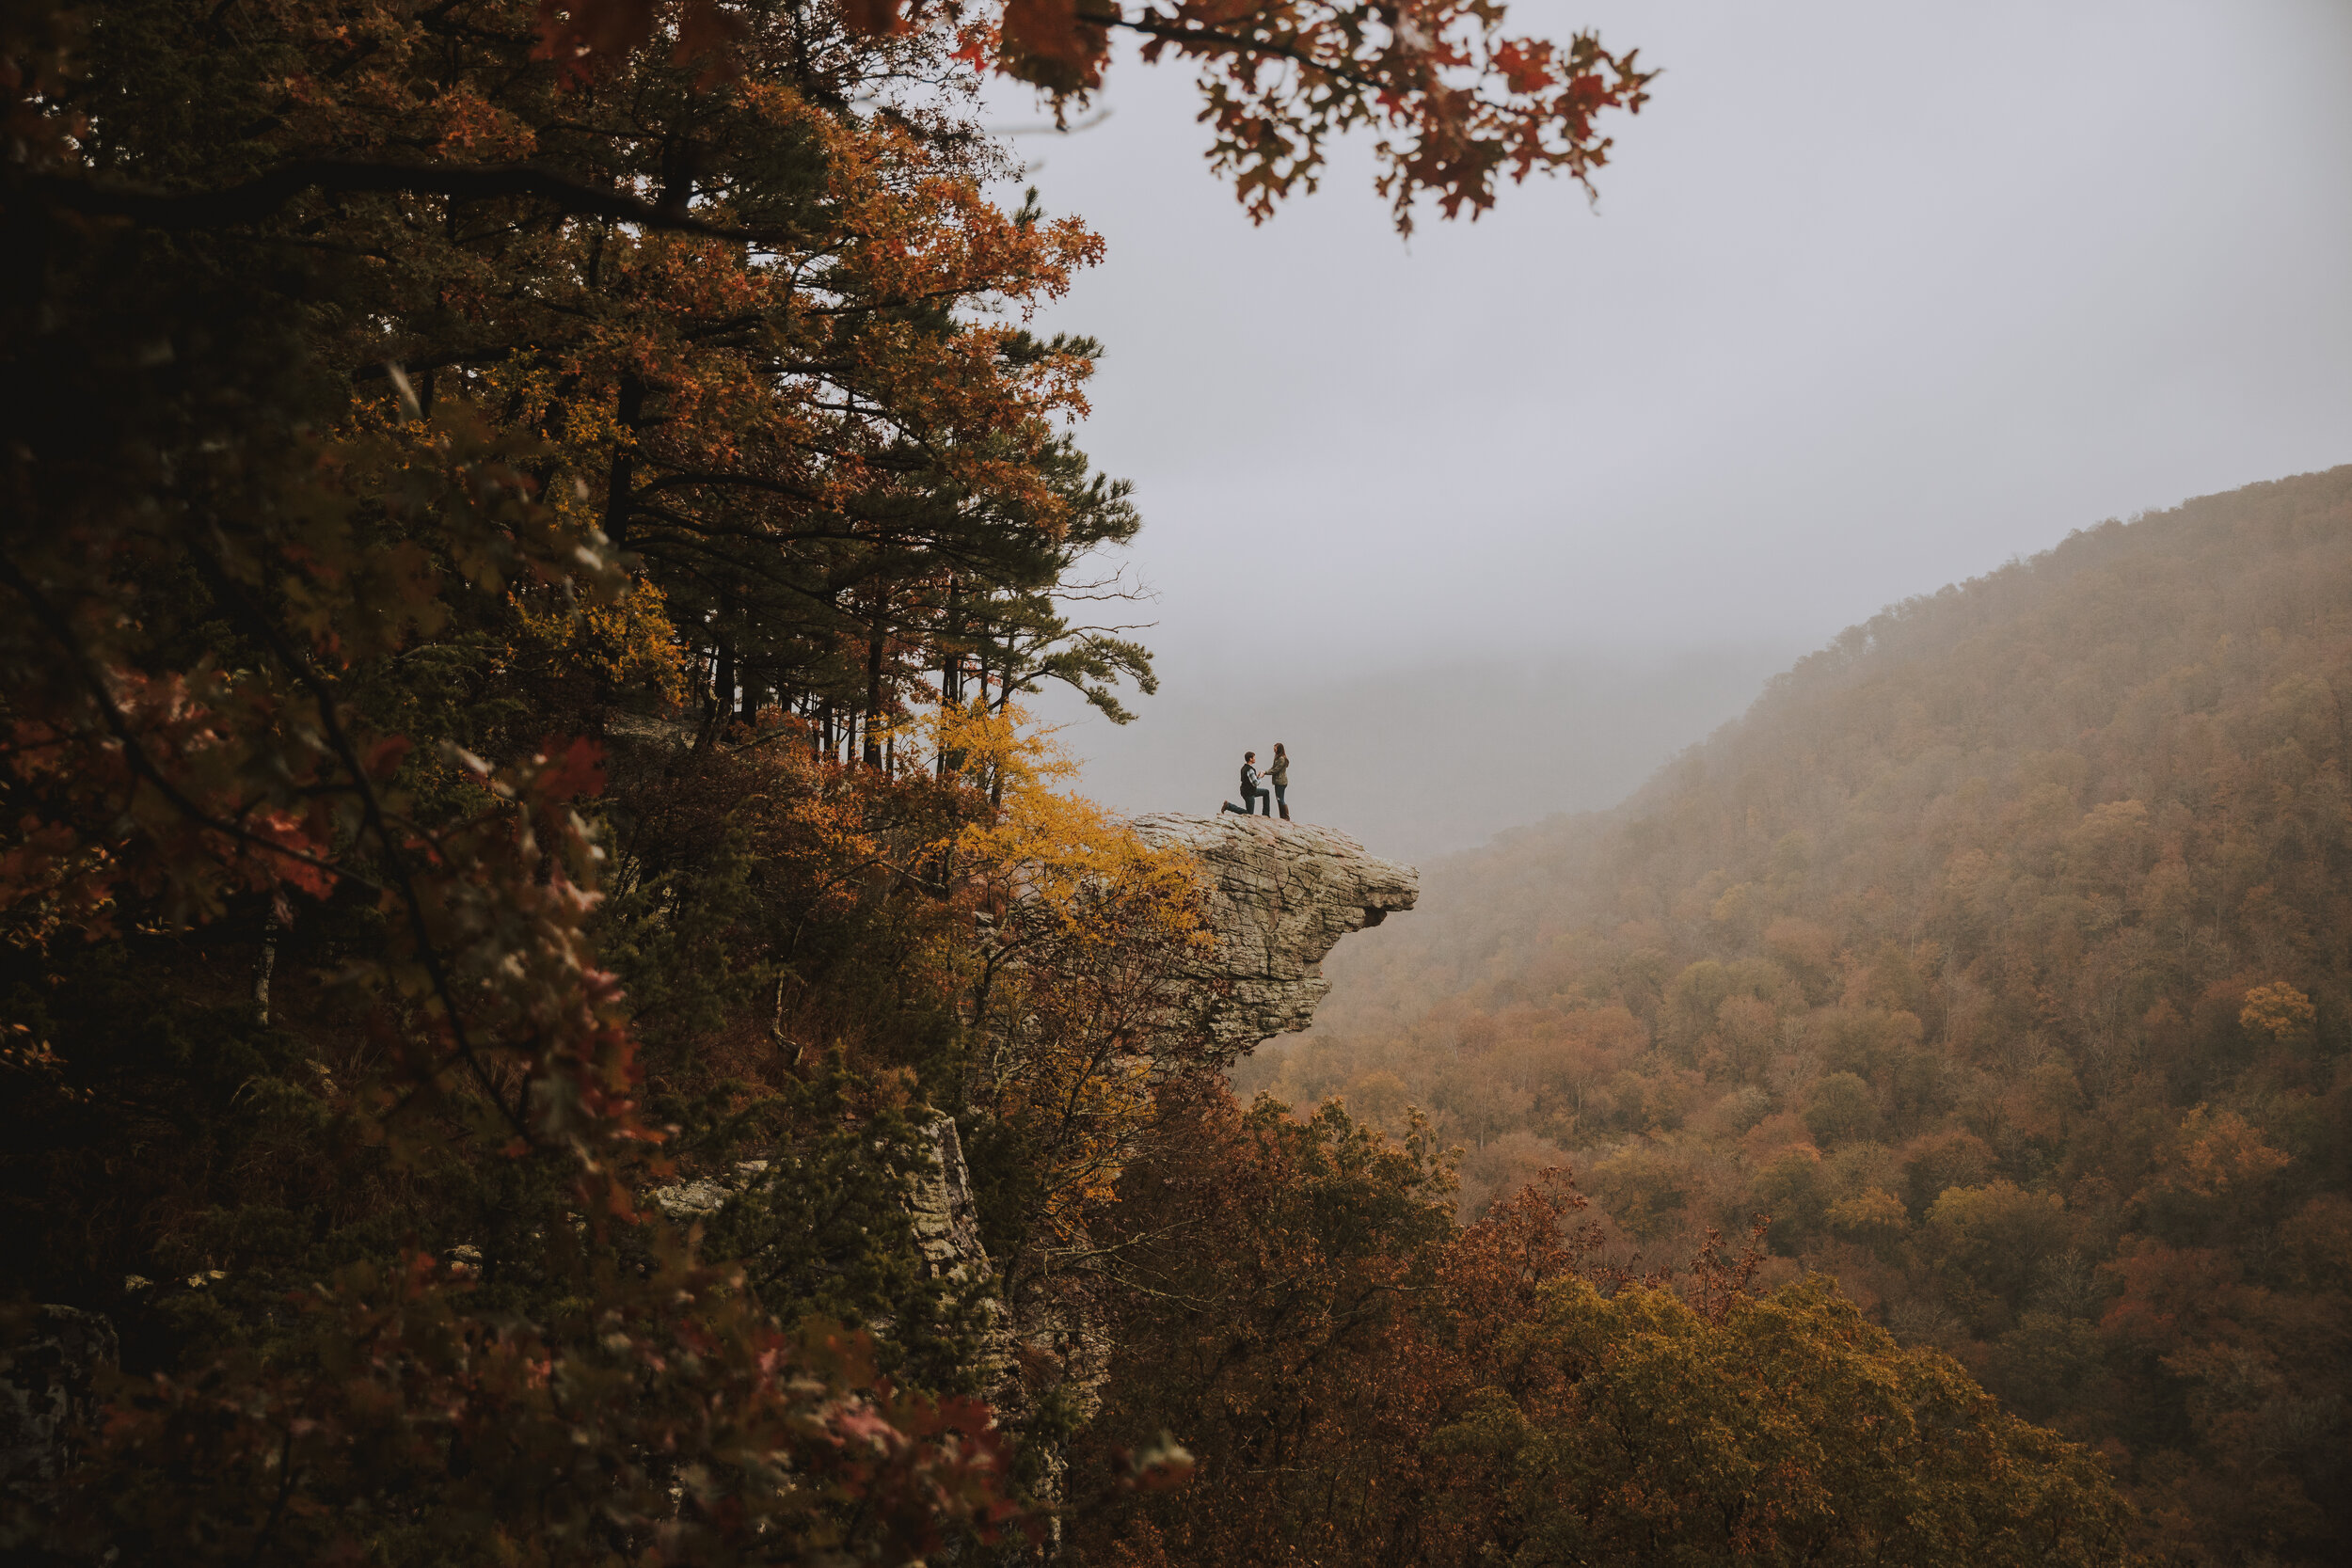 hawksbill crag proposal